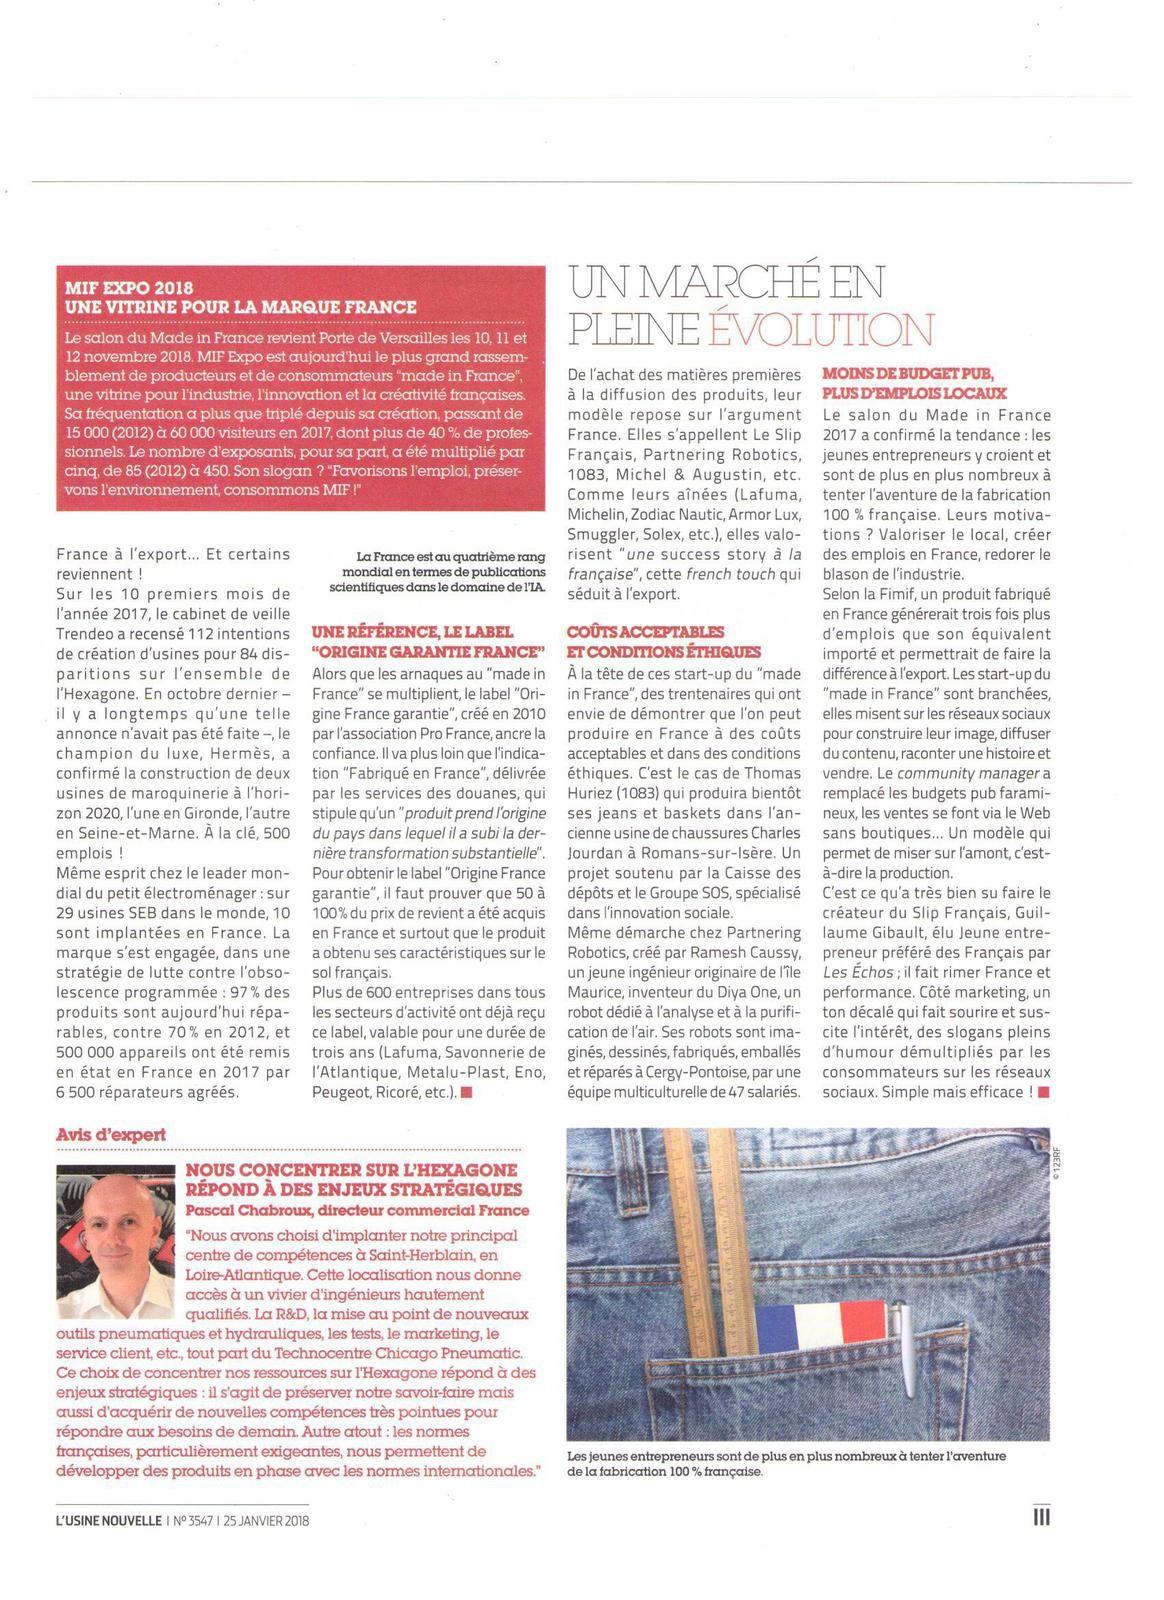 Vus et lus dans l'Usine Nouvelle n° 3547 du 25/01/18 et Univers Made in France n° 2